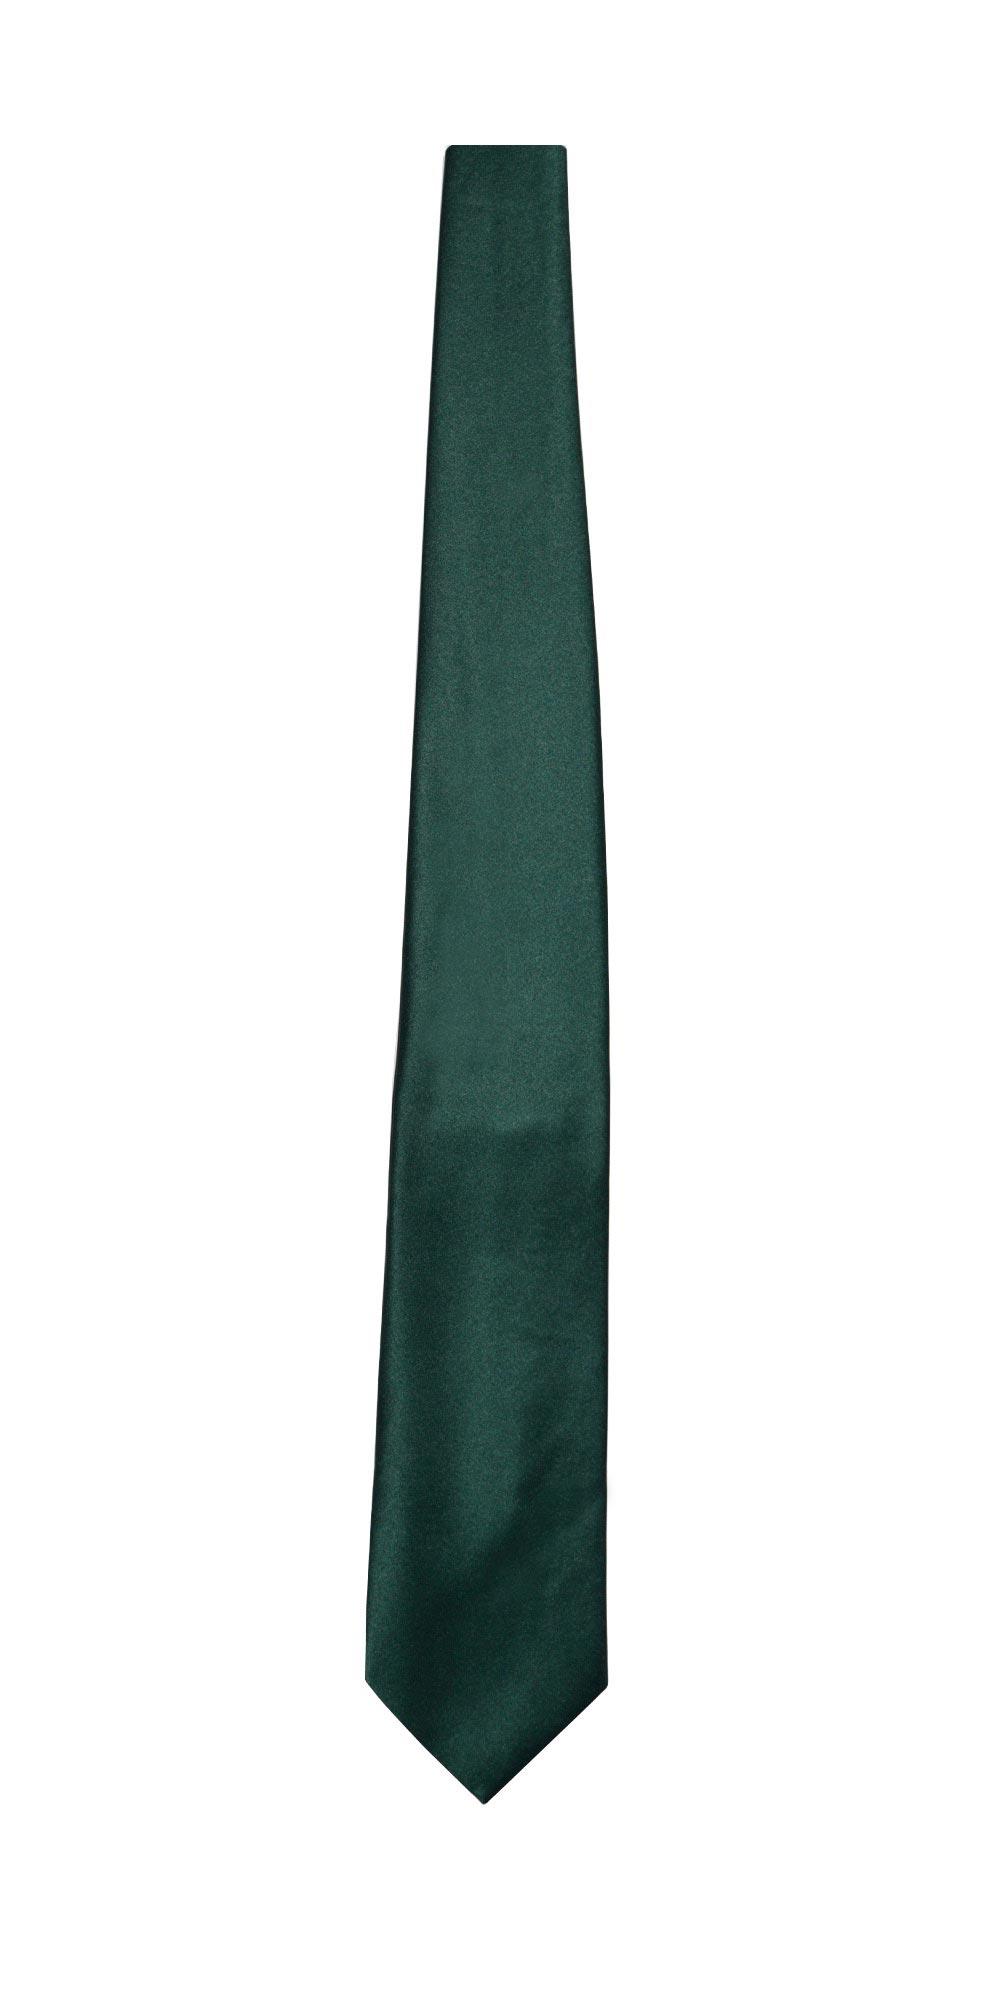 Great Hunter Green Tie